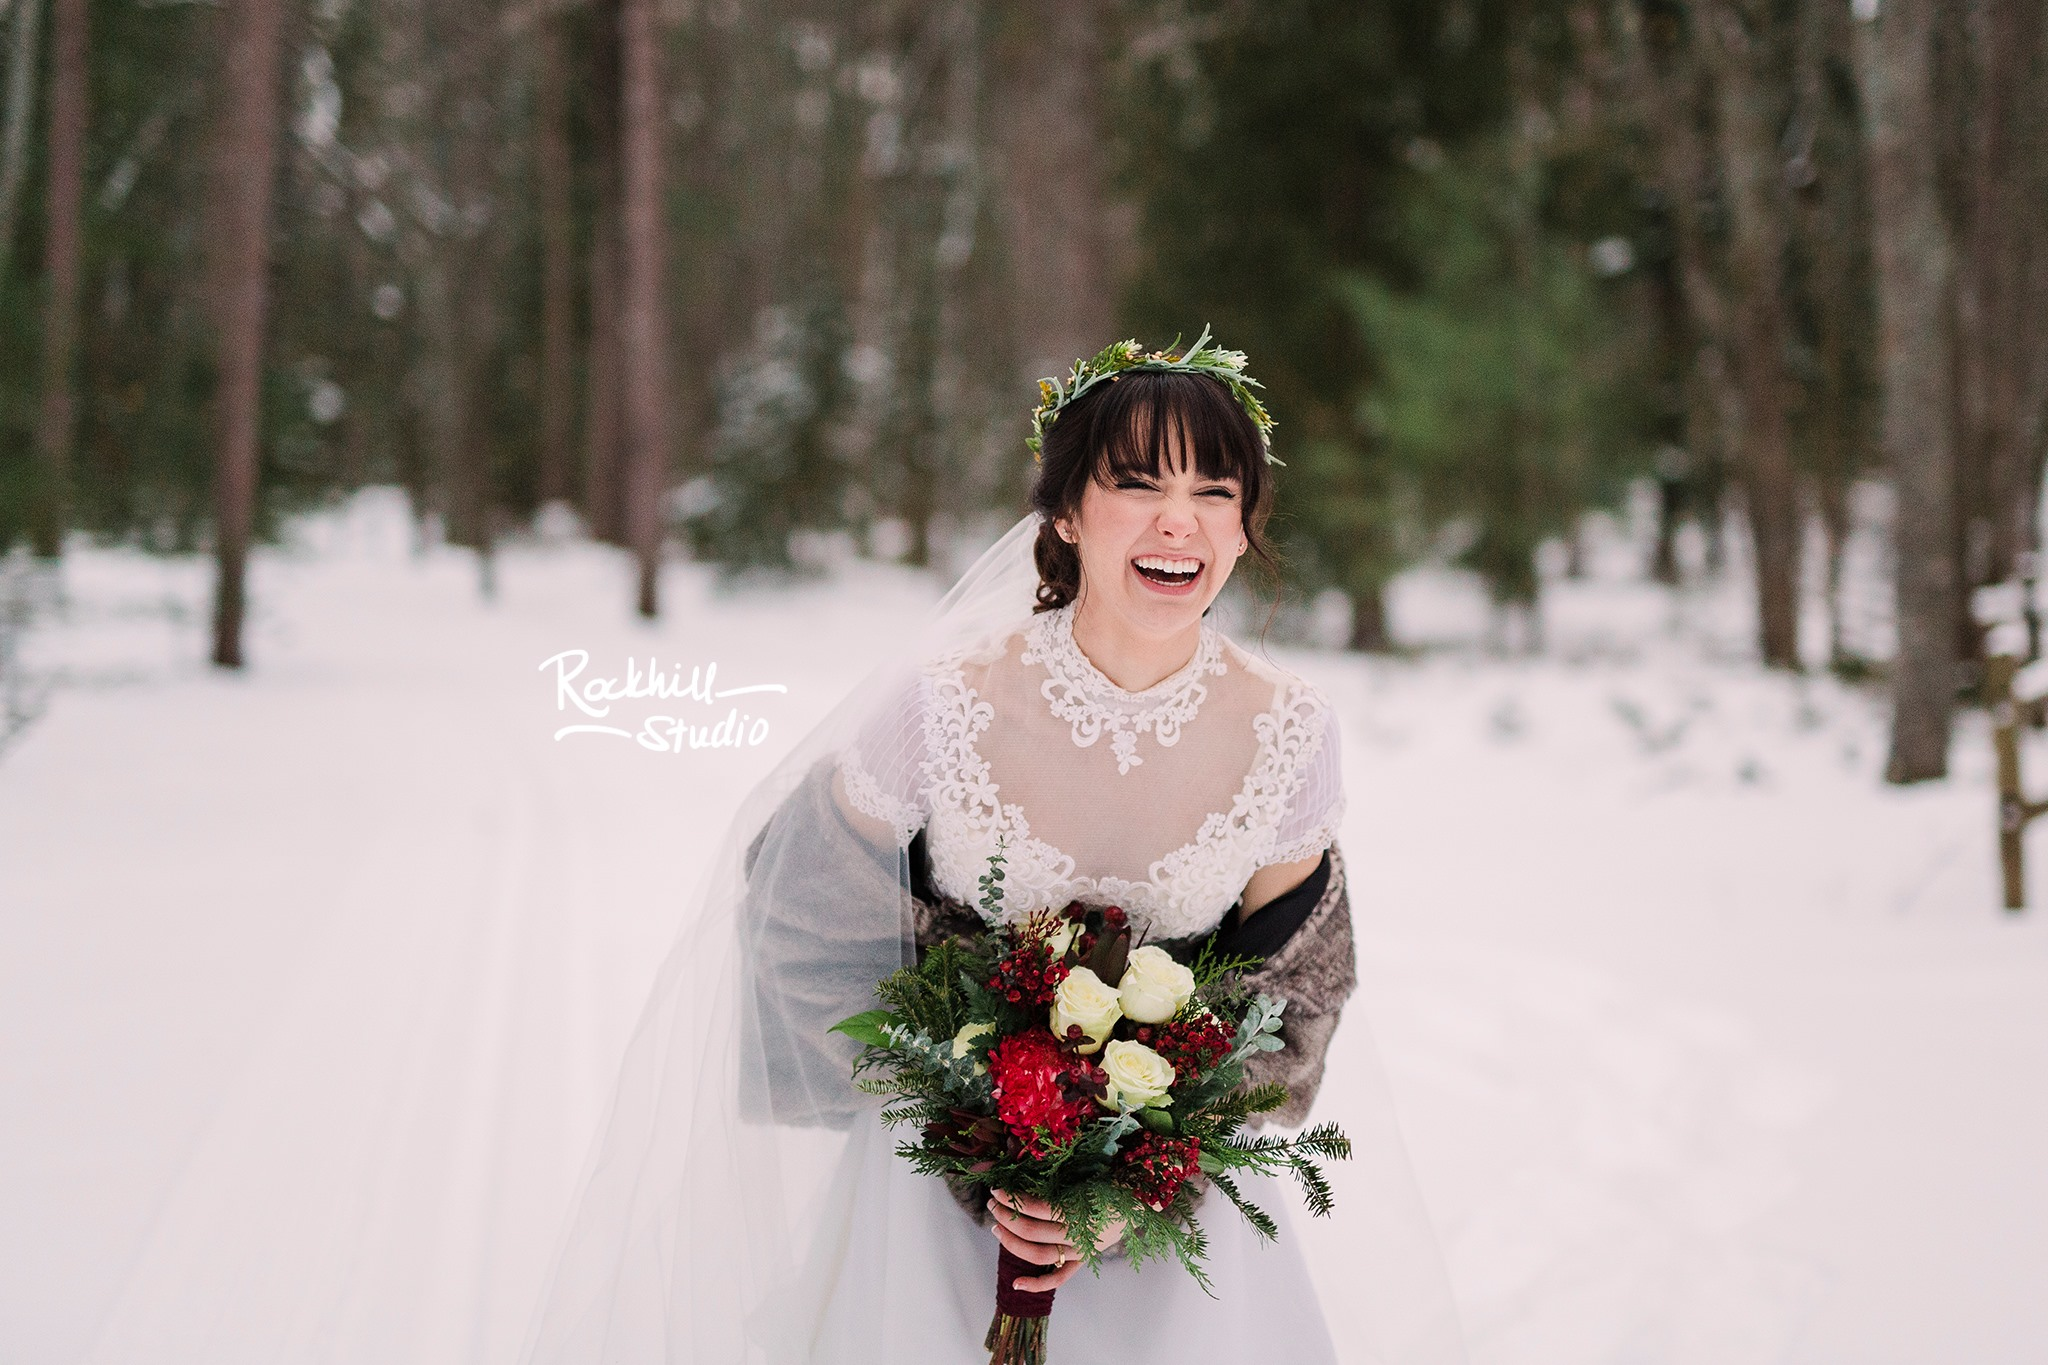 traverse_city_wedding_photographer_winter_rockhill_bride_1.jpg